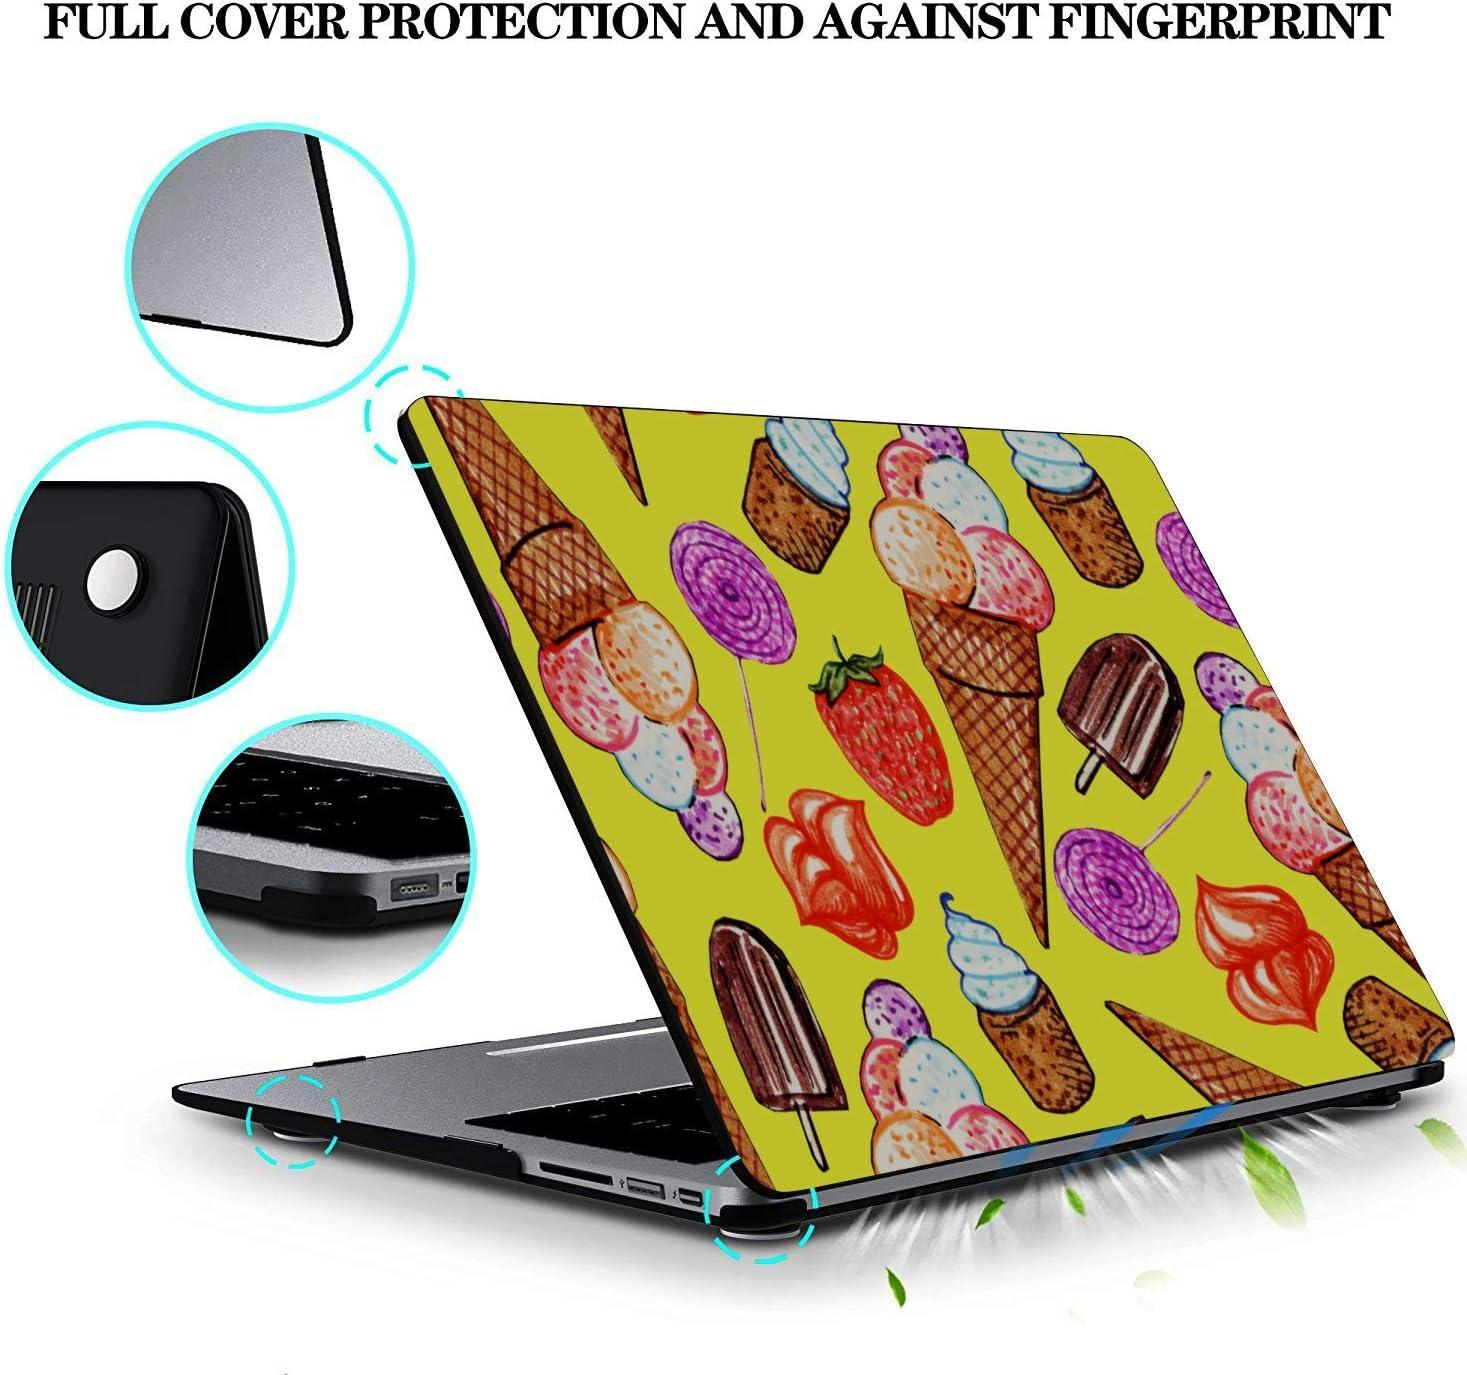 Case MacBook Pro 13 Summer Dessert Pointer Ice Cream Plastic Hard Shell Compatible Mac Air 11 Pro 13 15 12 Inch MacBook Case Protection for MacBook 2016-2019 Version